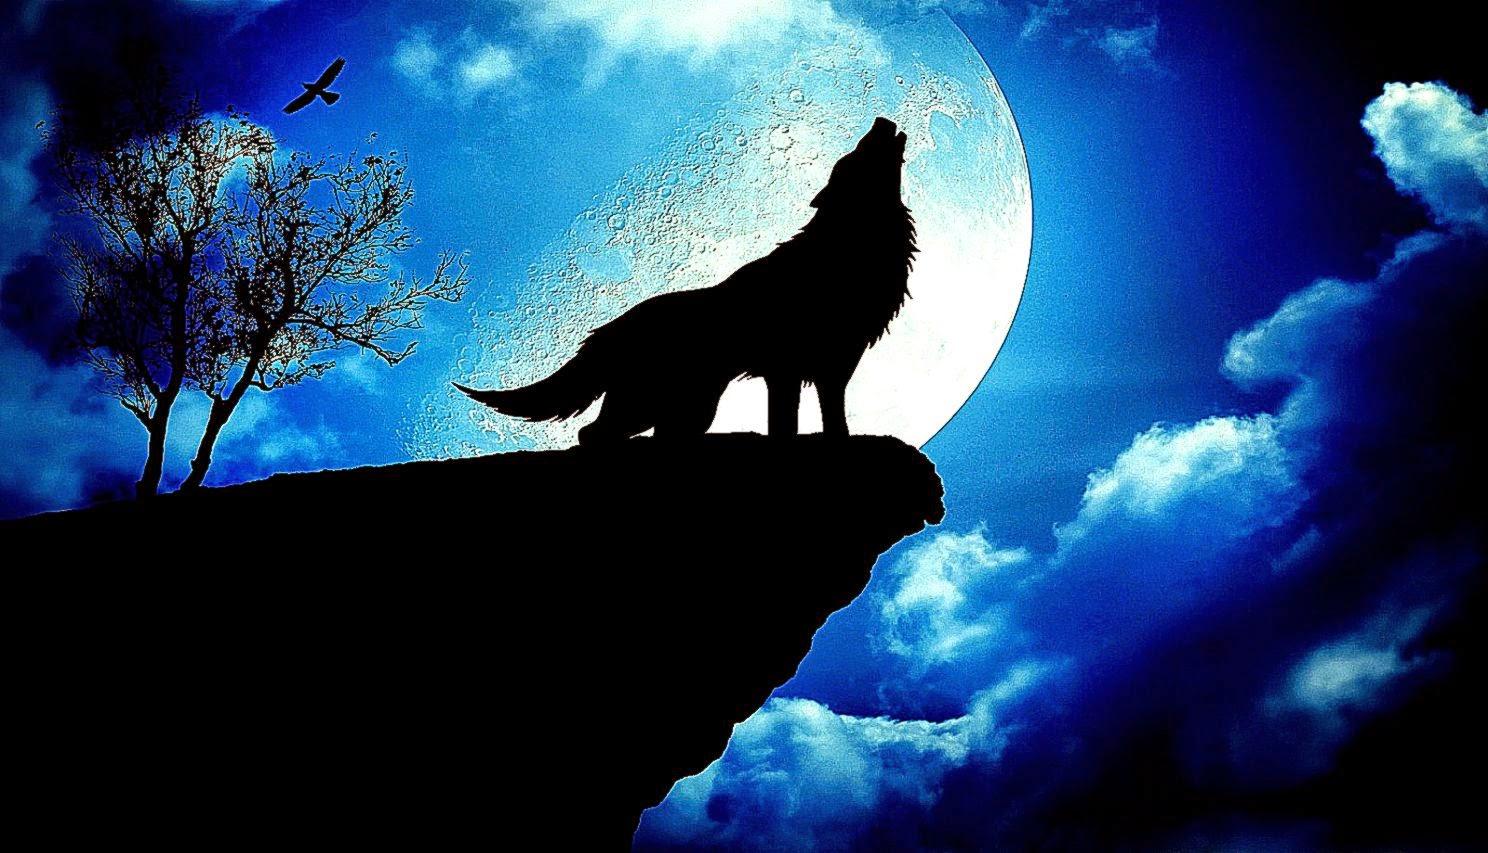 blue moon wolf wallpaper - photo #19